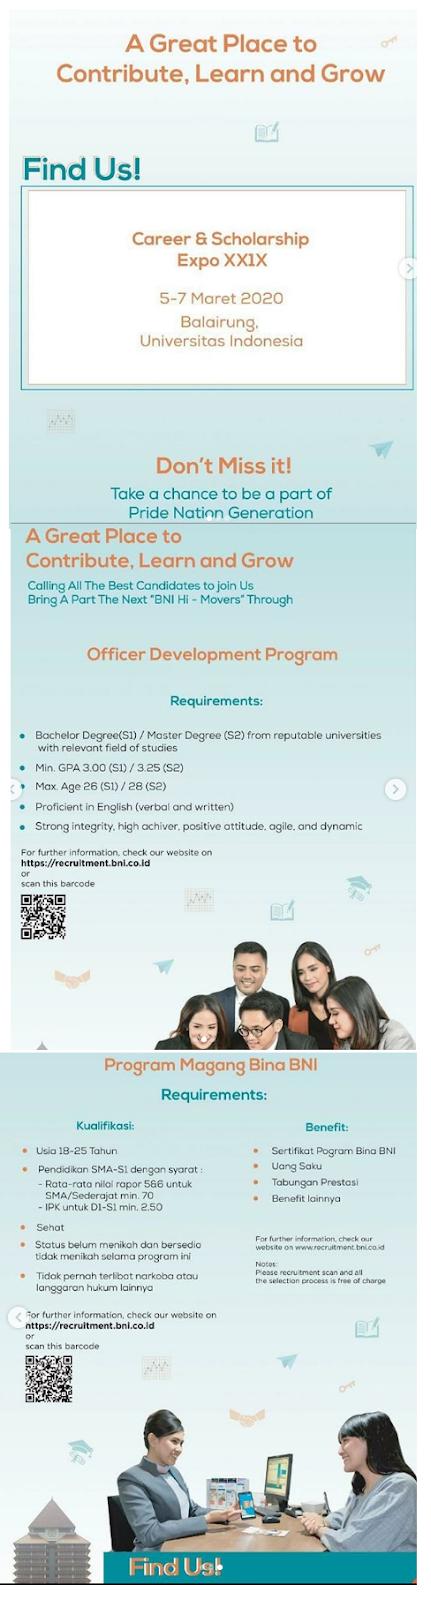 Rekrutmen ODP dan Bina BNI PT Bank Negara Indonesia (Persero) Via UI Career and Scholarship Expo